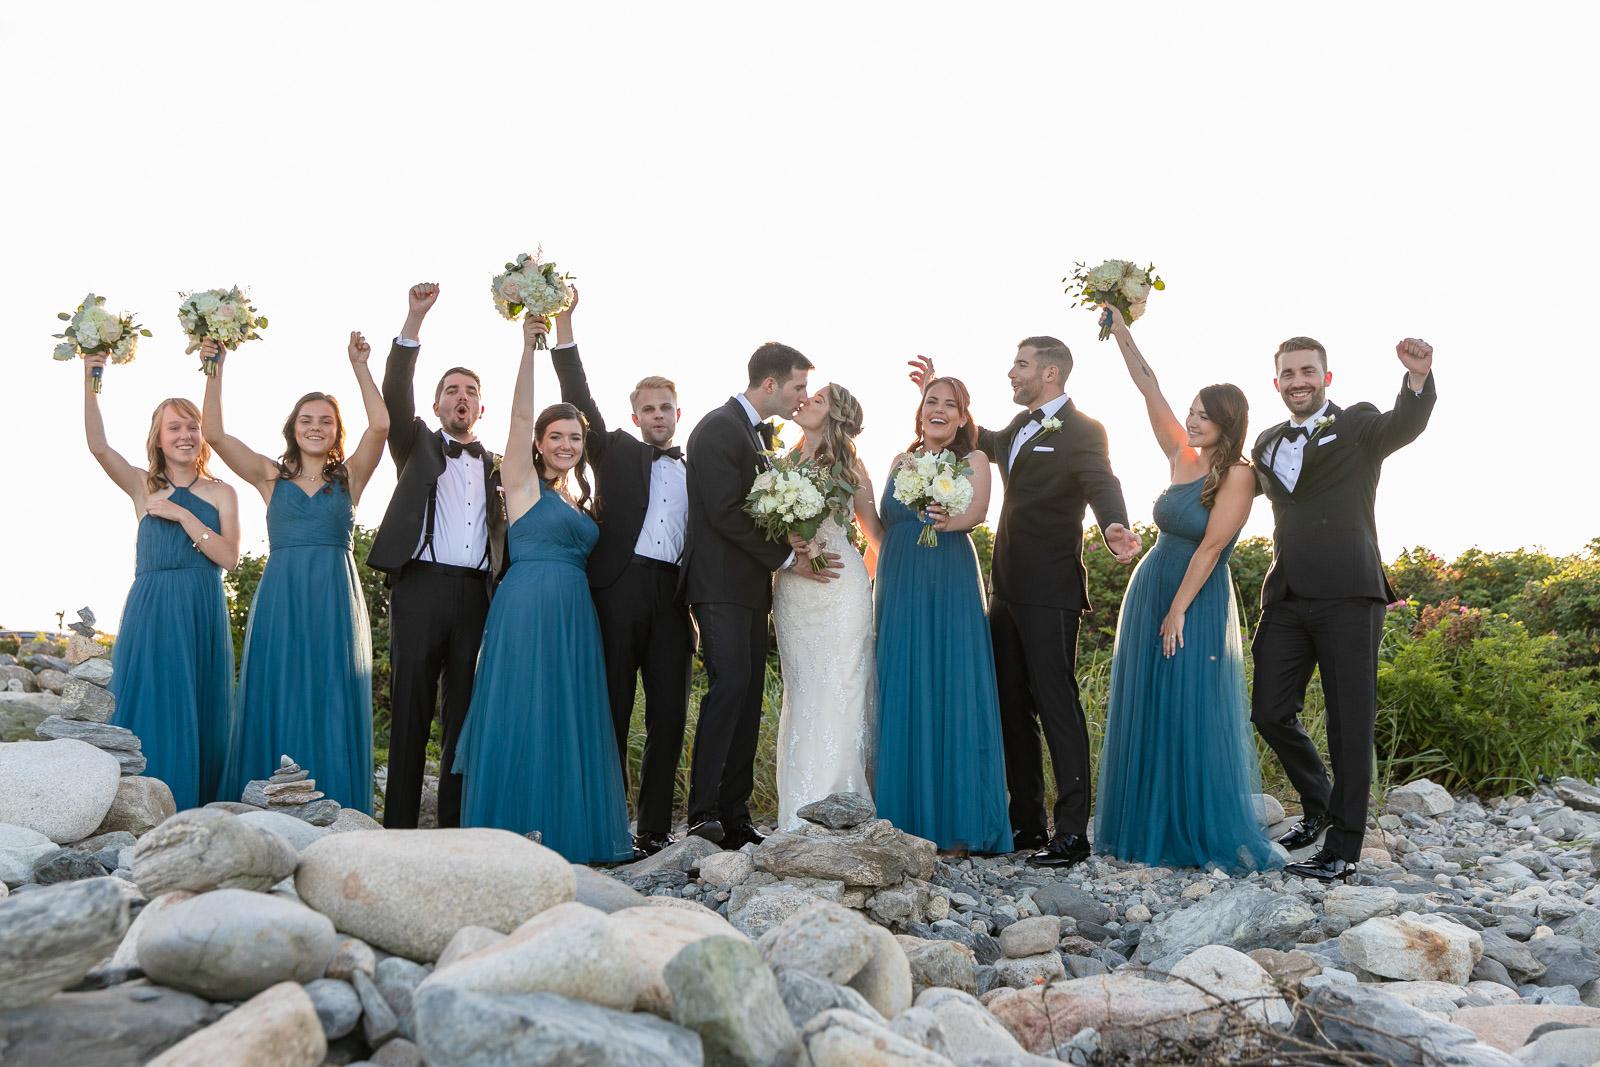 Wedding, Narragansett Towers, The Towers, Narragansett, Rhode Island, RI, Tracy Jenkins photography, RI wedding photographer, Rhode Island wedding photographer, wedding formals, bridal party, wedding party, wedding party formals, navy dresses